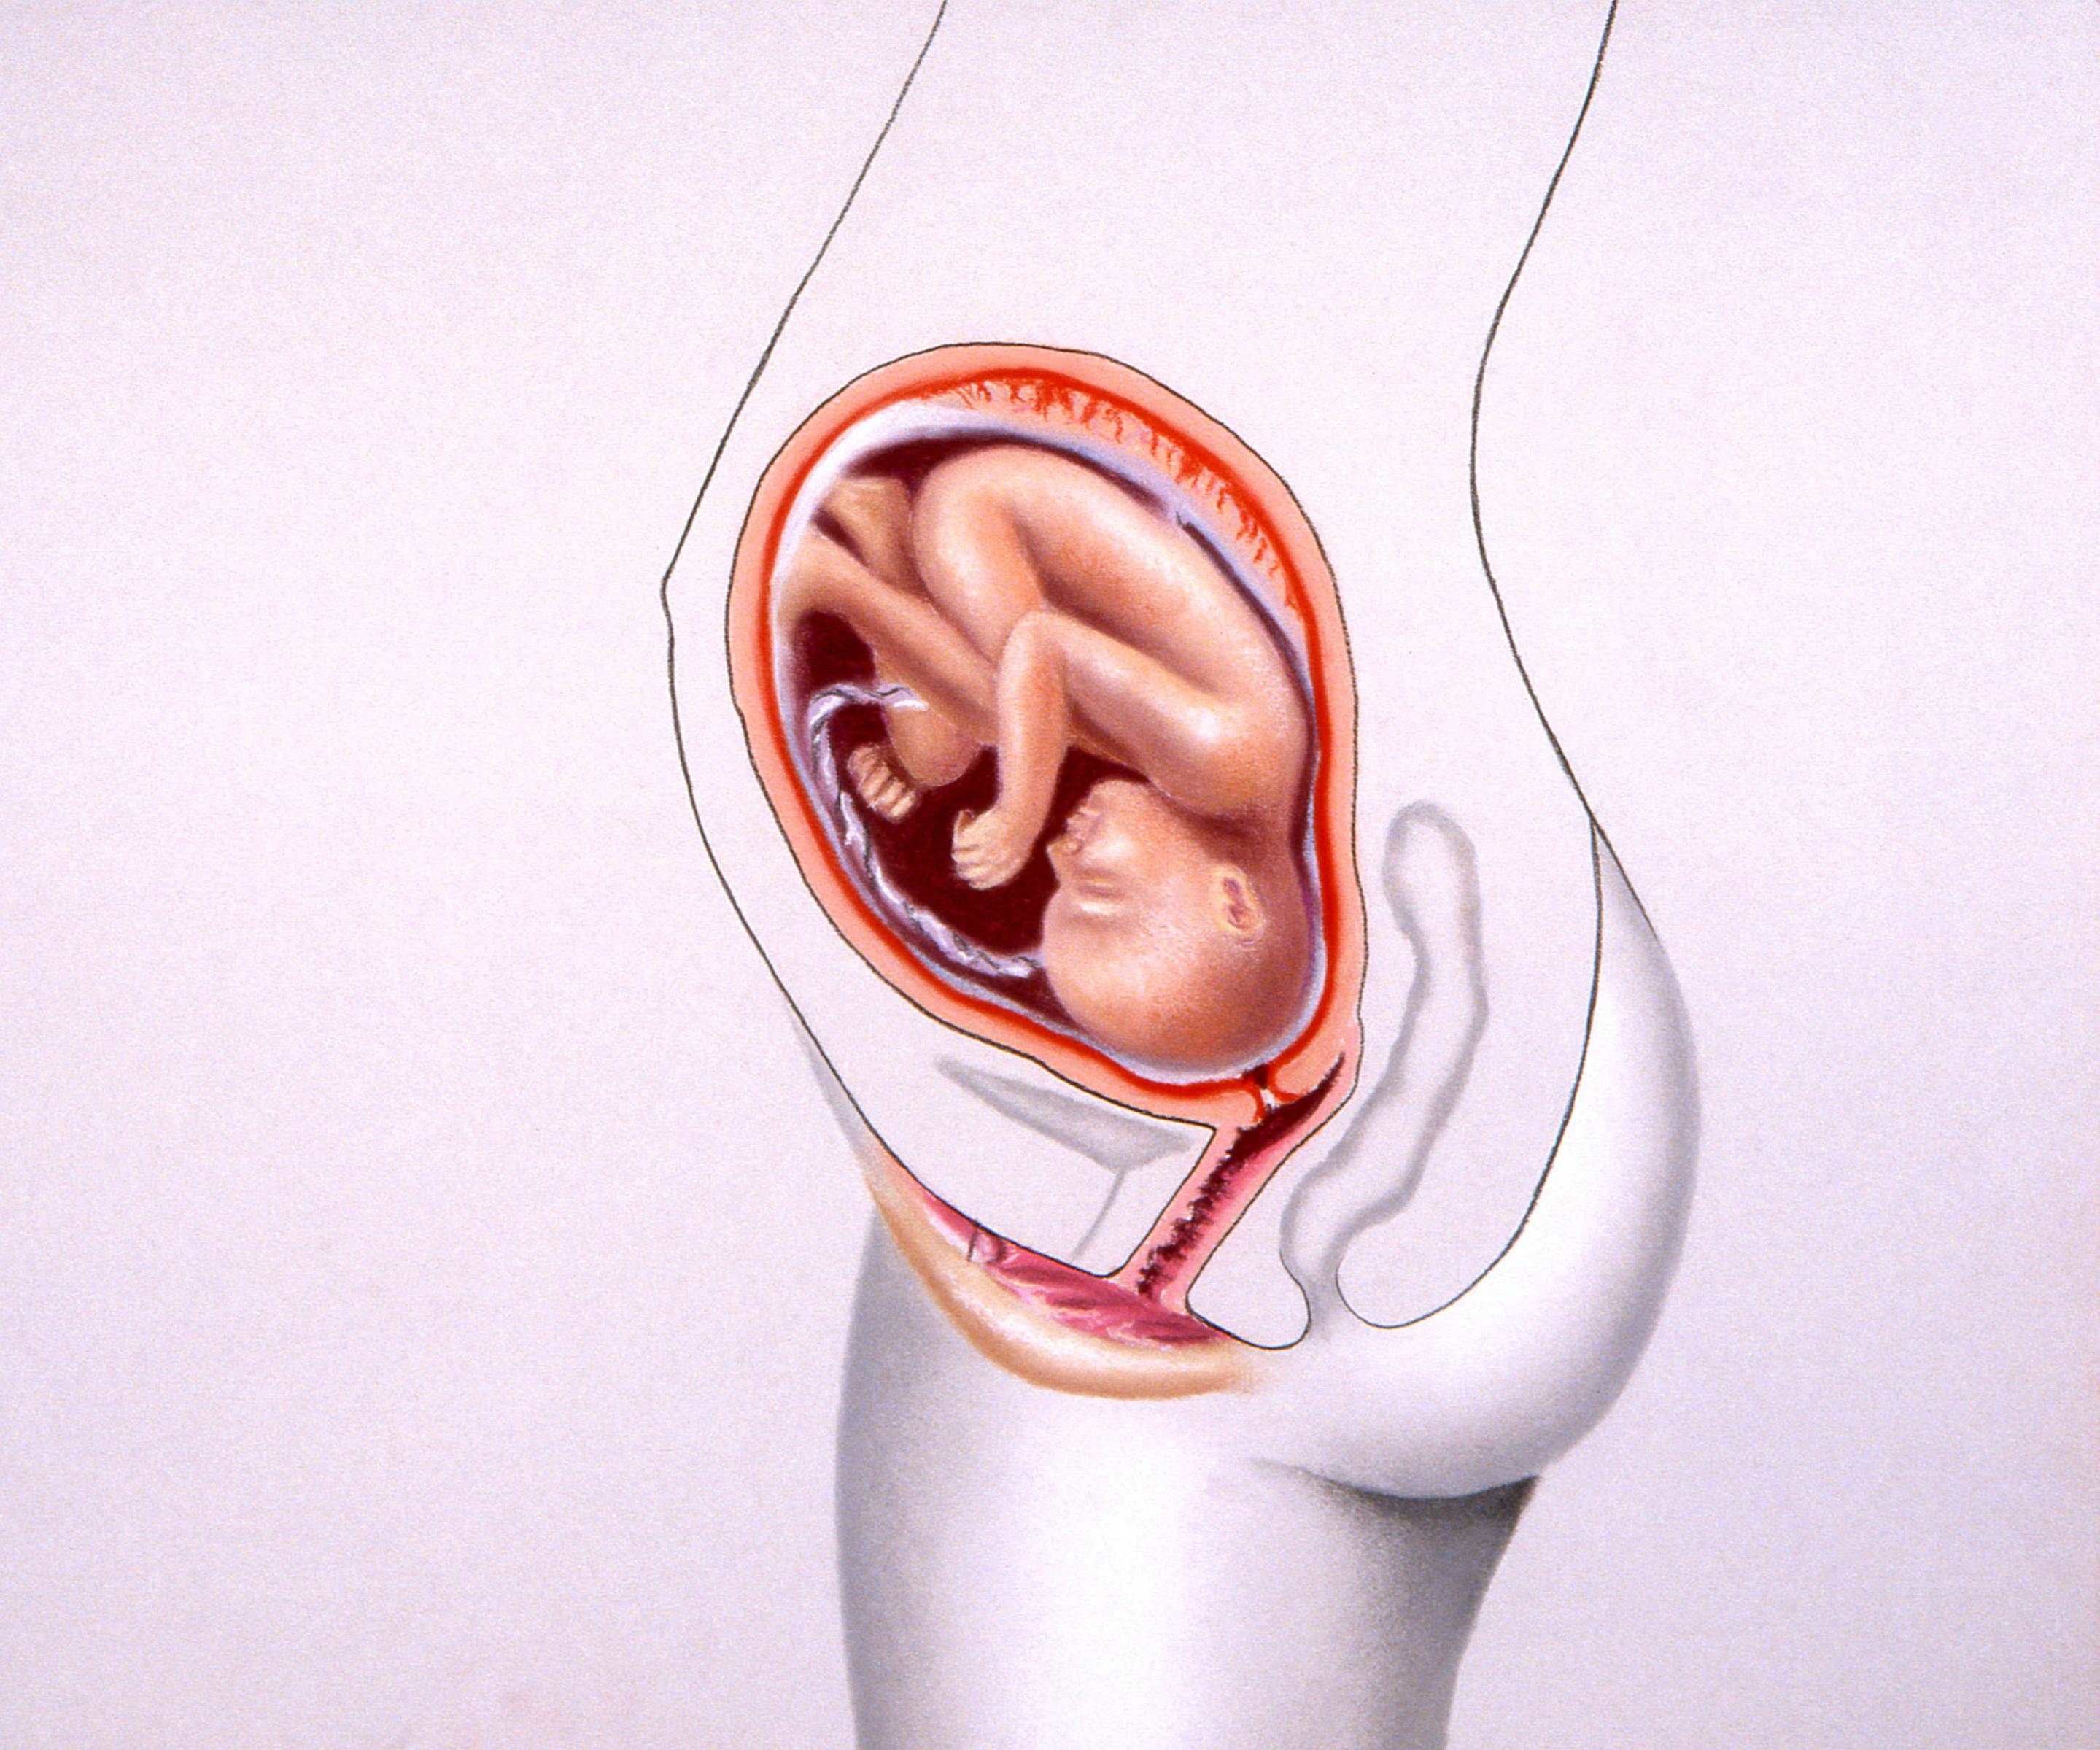 Ertasten gebärmutter schwangerschaft Fundusstand Schwangerschaft: